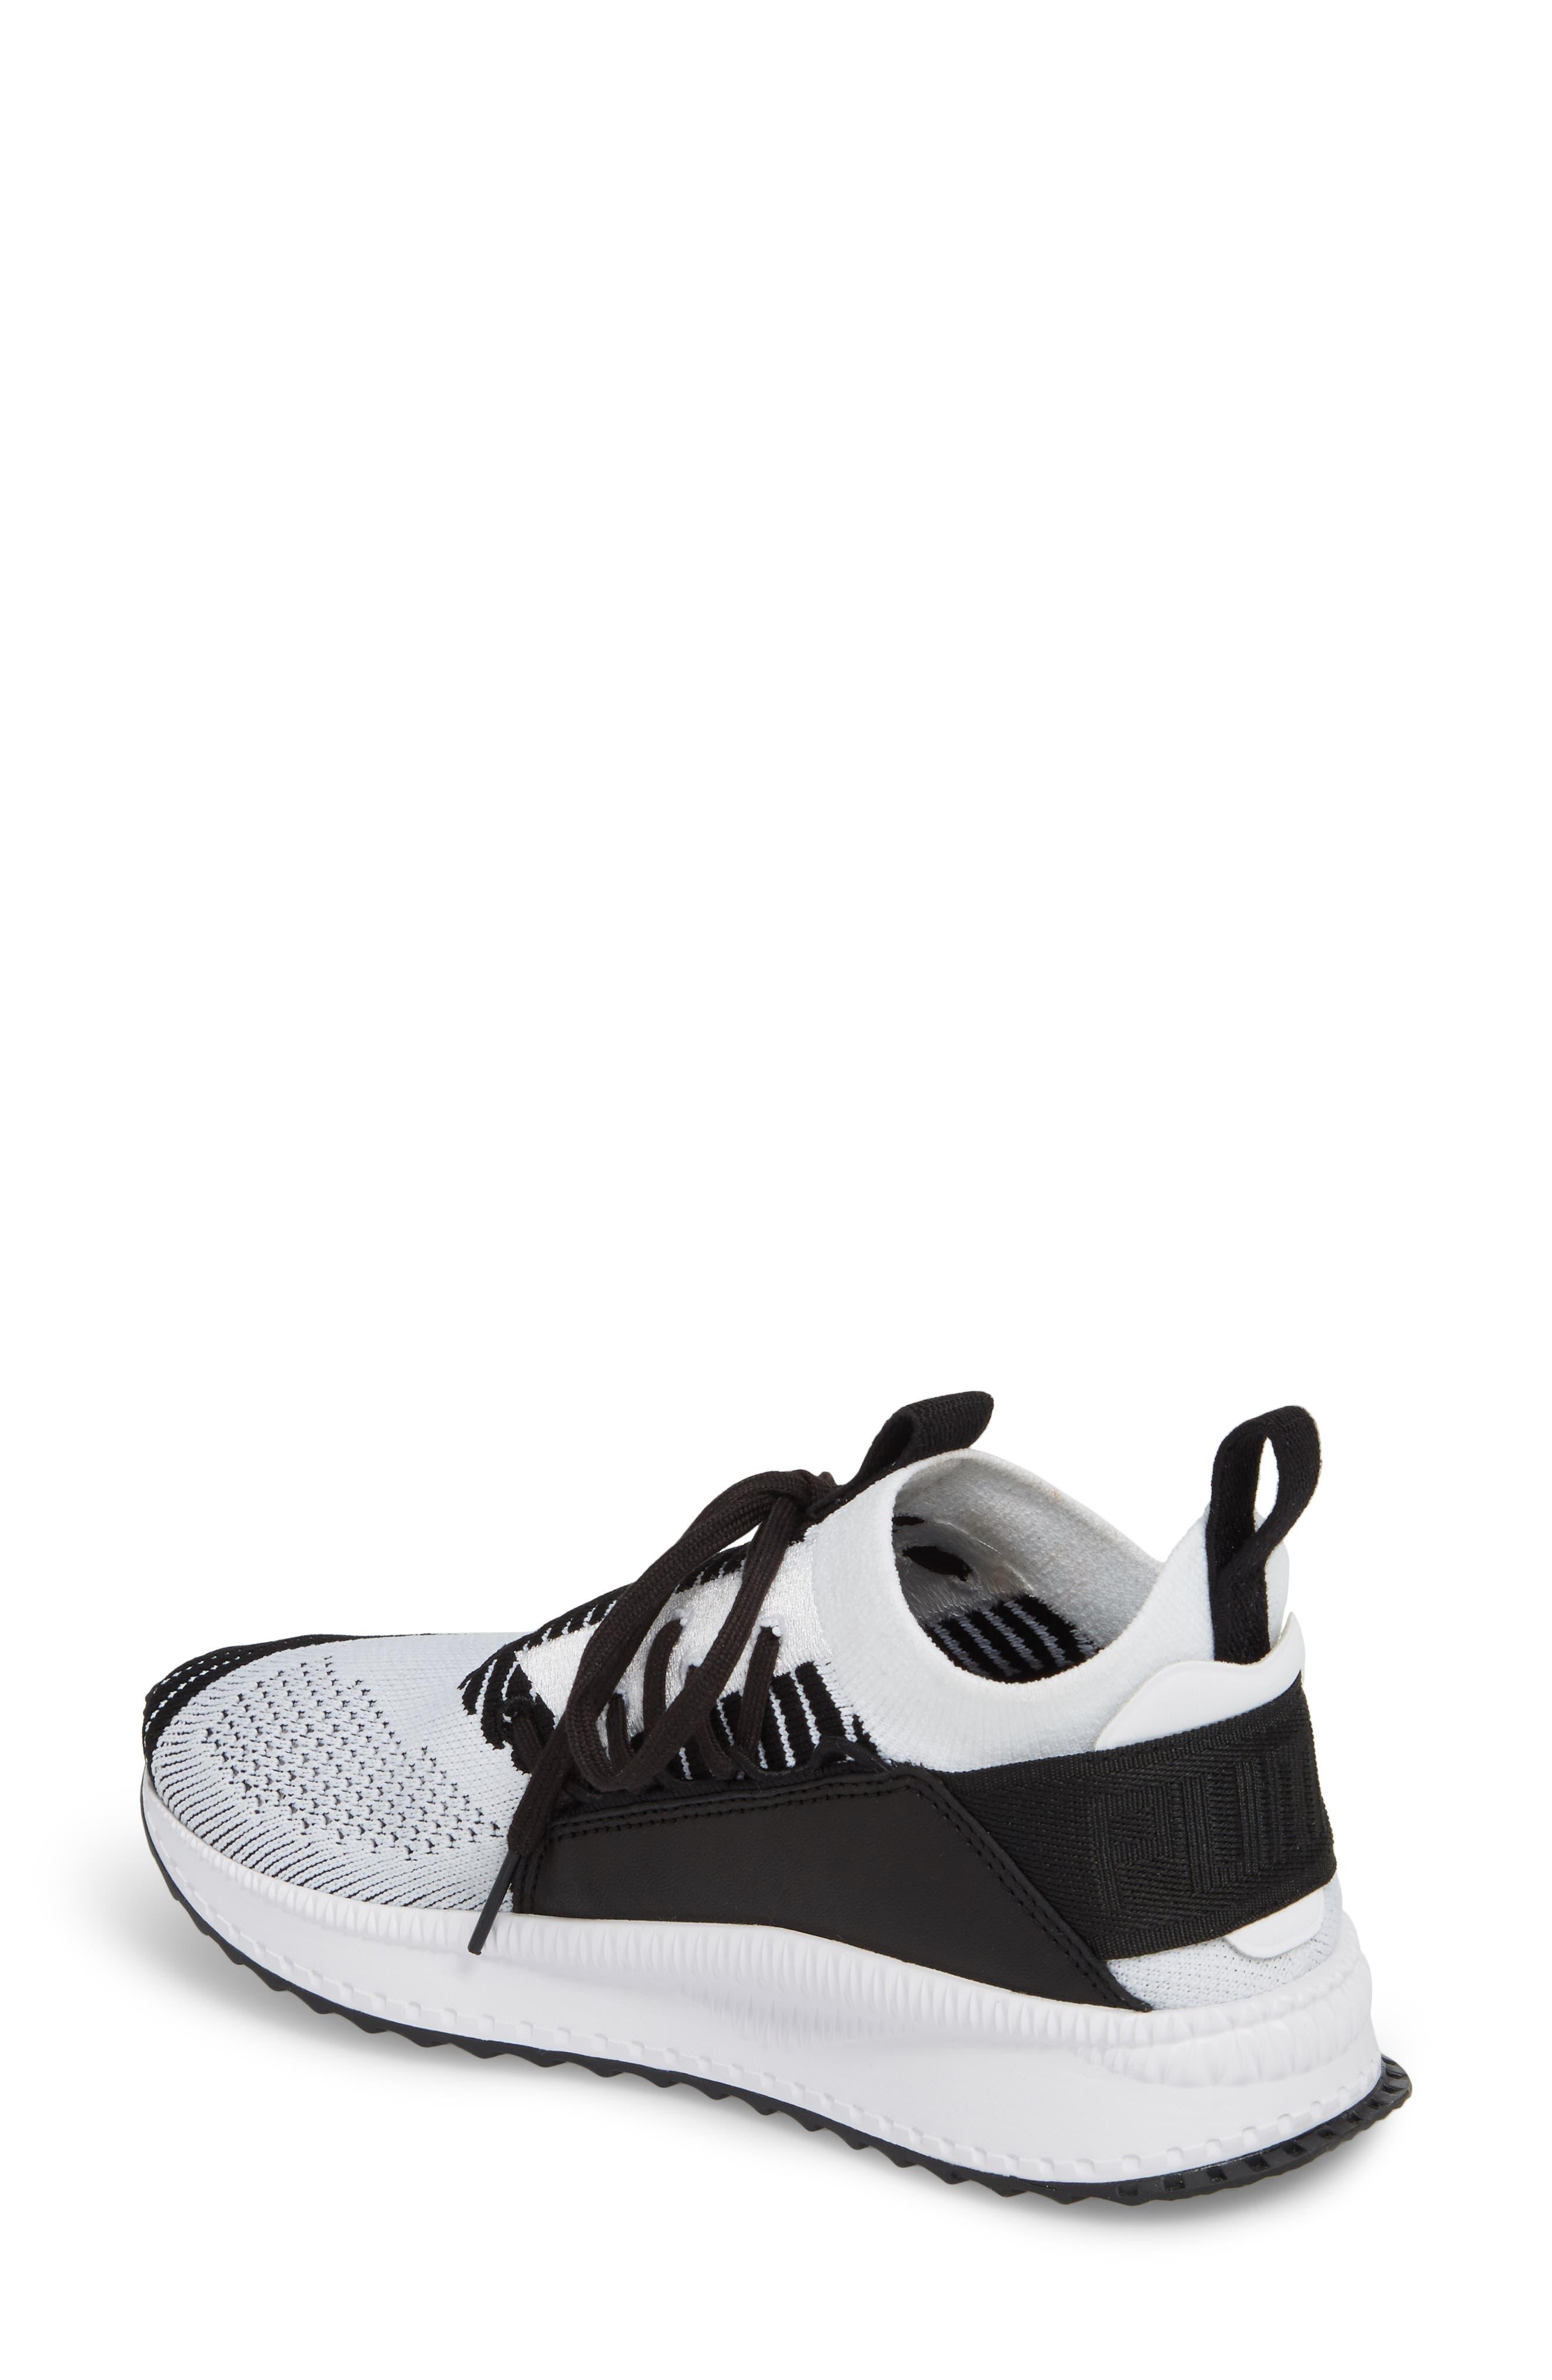 Tsugi Jun Knit Sneaker,                             Alternate thumbnail 9, color,